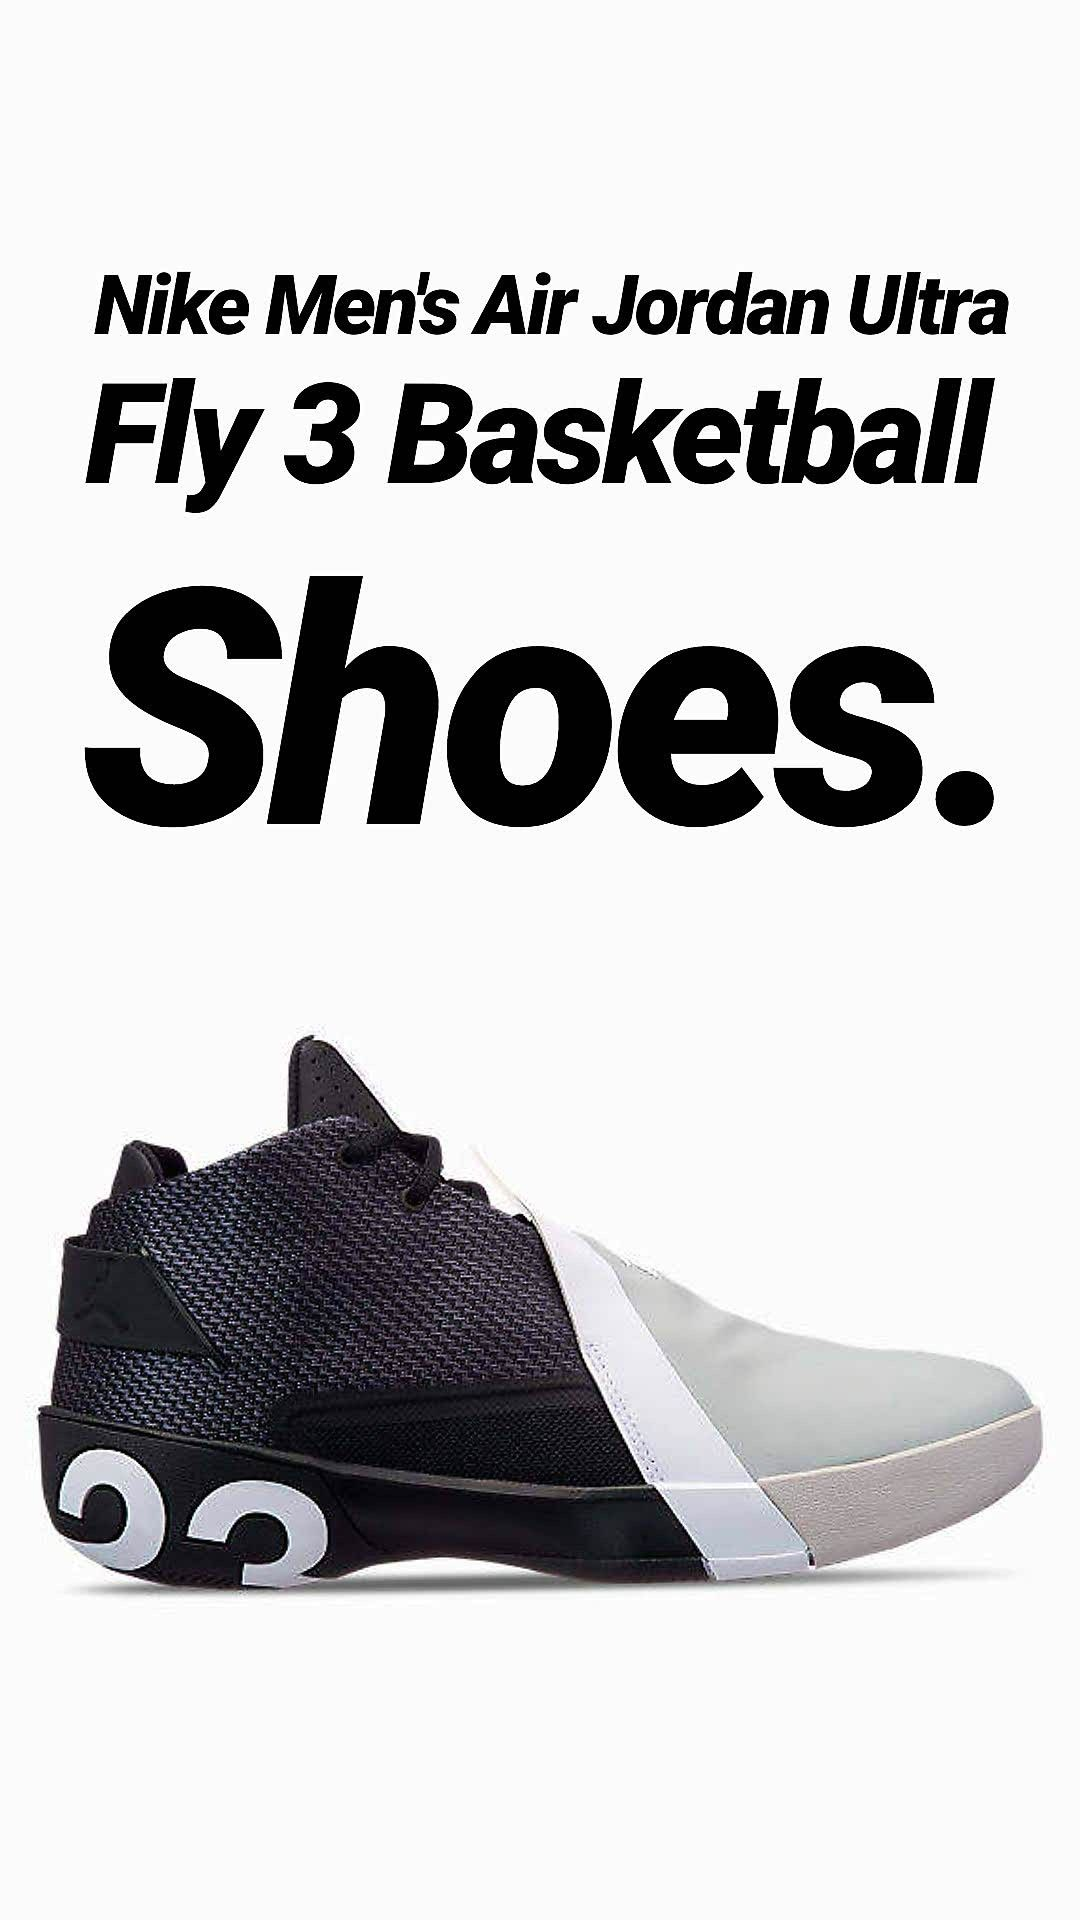 Adidas NMD_R1 WMNS (Core Black) Sneaker Freaker laulyyy